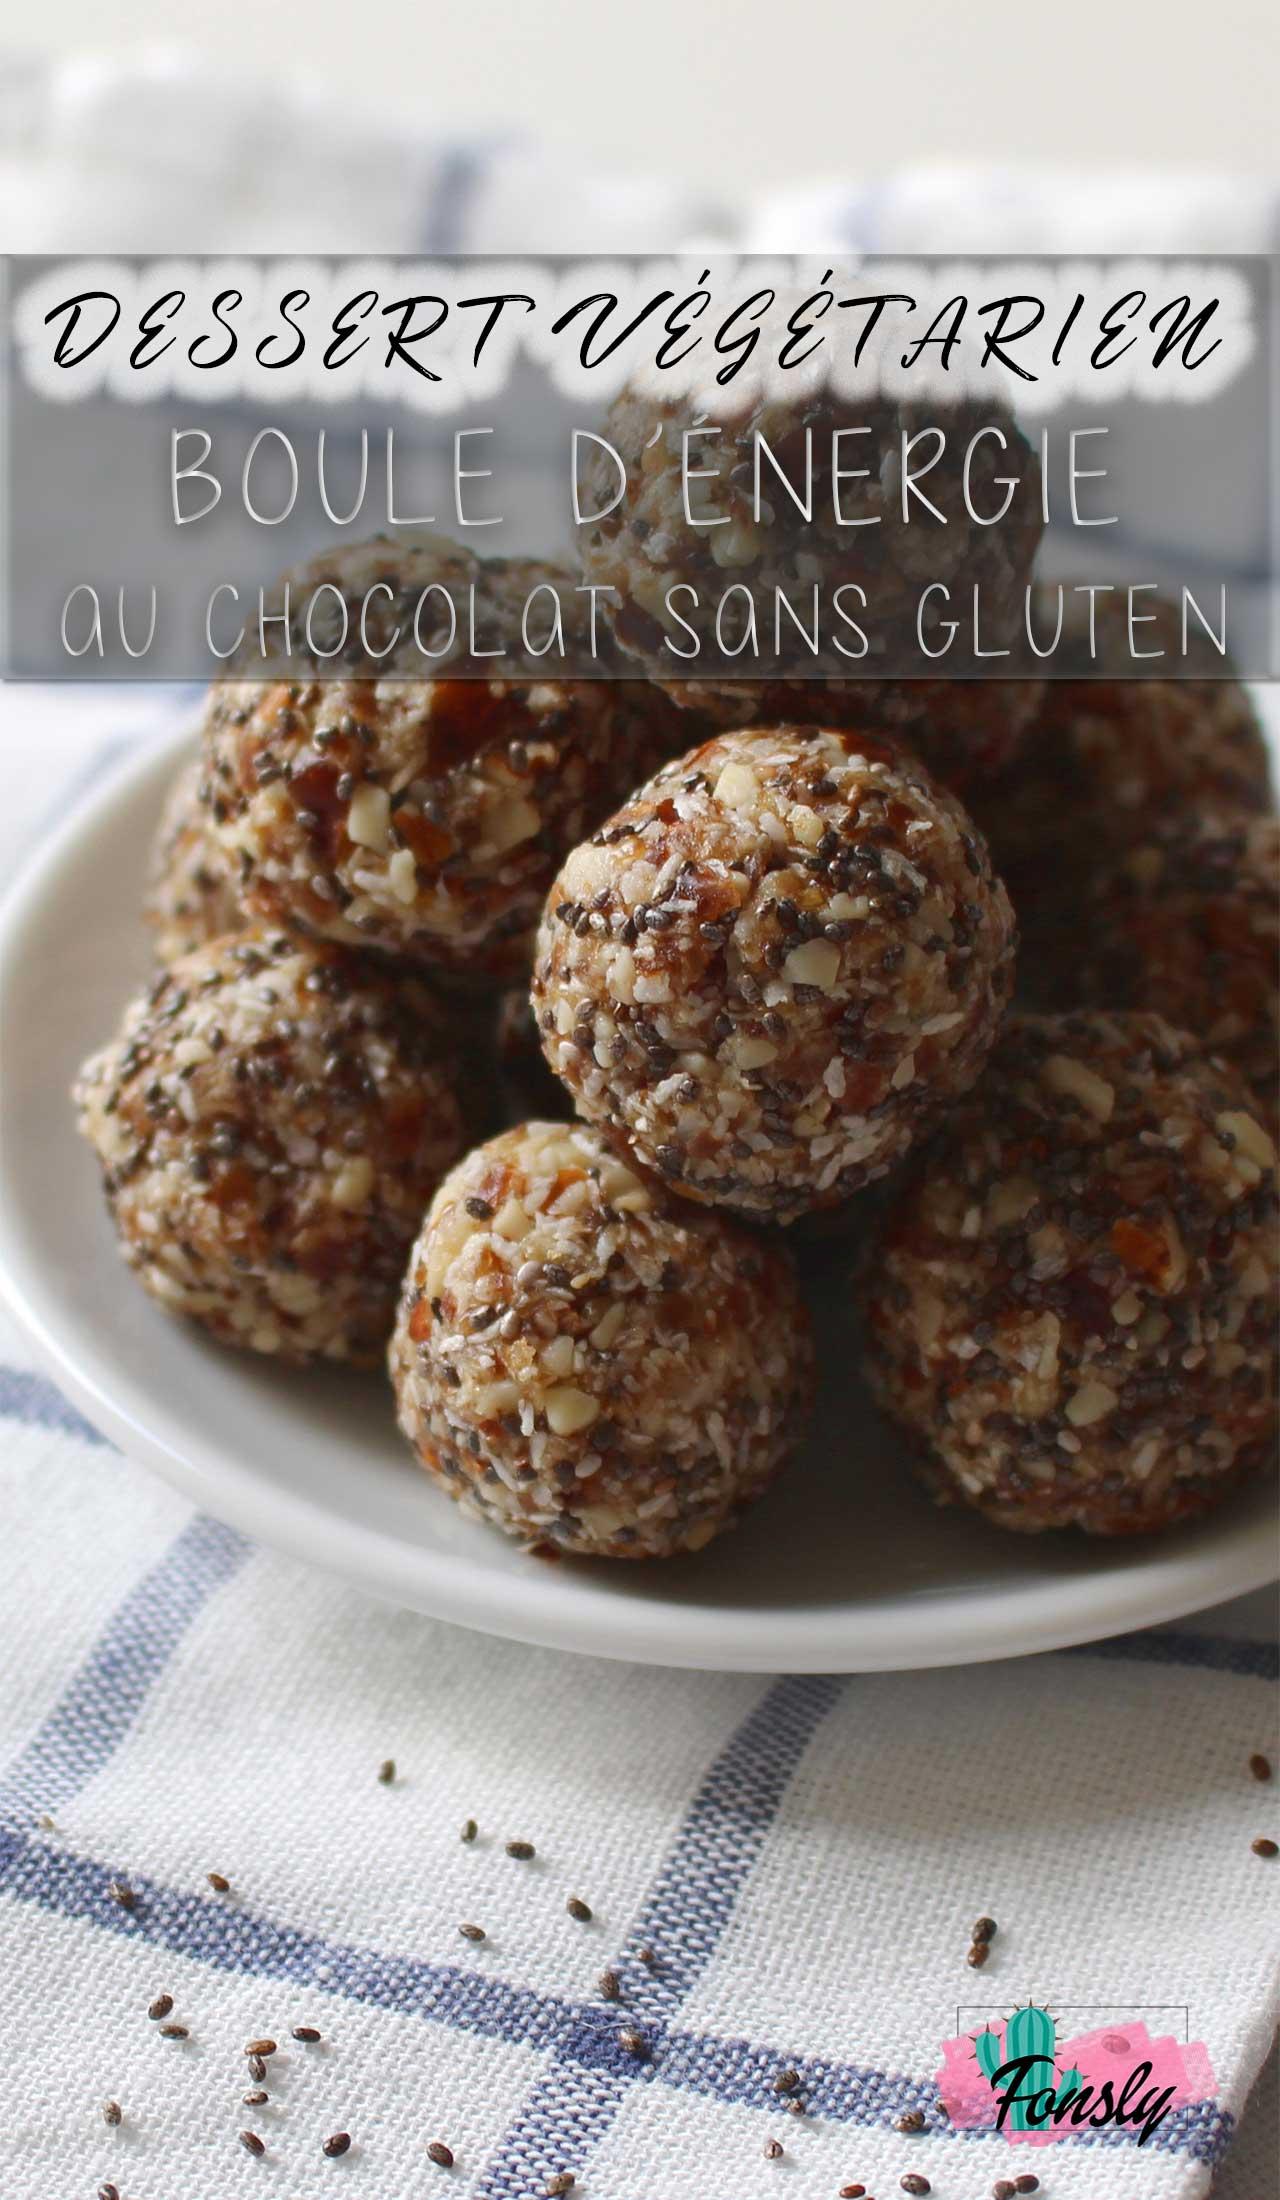 dessert végétarien, recette chocolat sans gluten